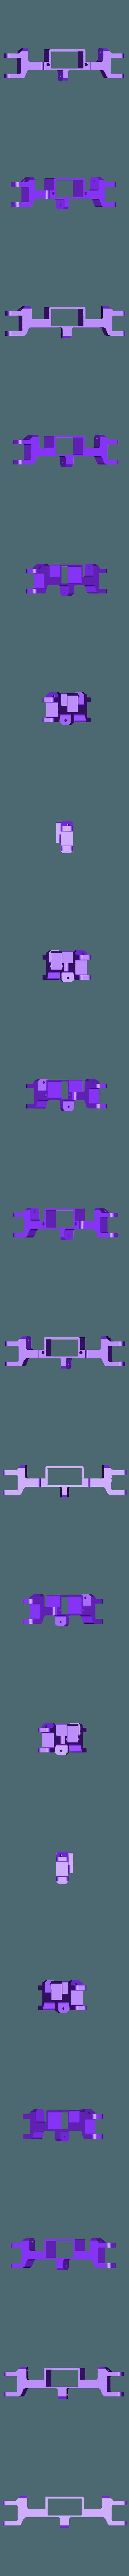 Beamaxle_servo_STD.STL Download free STL file Printed truck V2: Front axle • 3D printable design, MrCrankyface